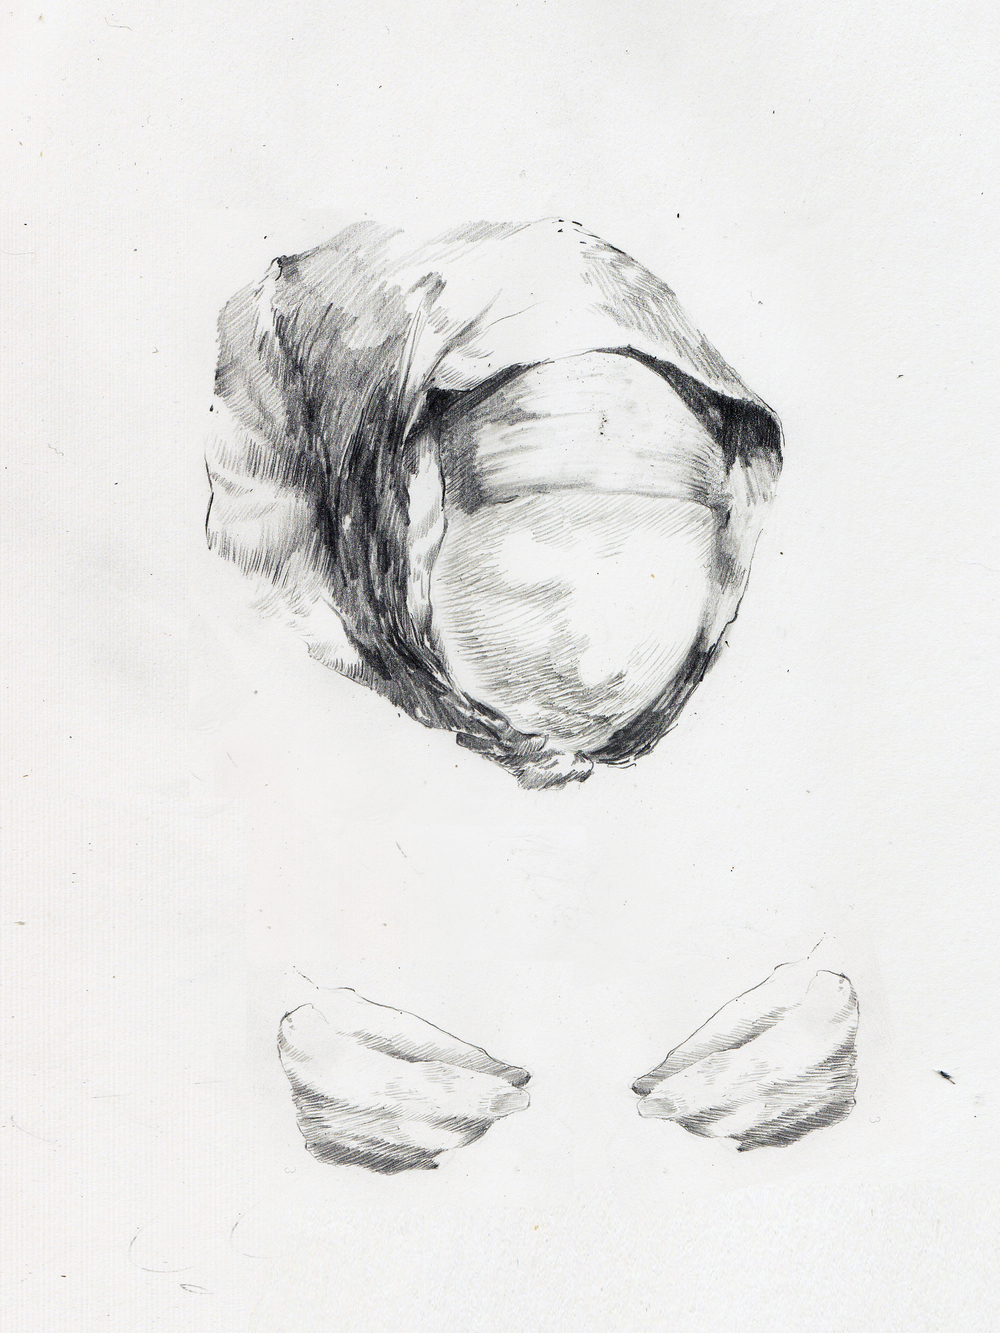 Graphite on paper, 2014.